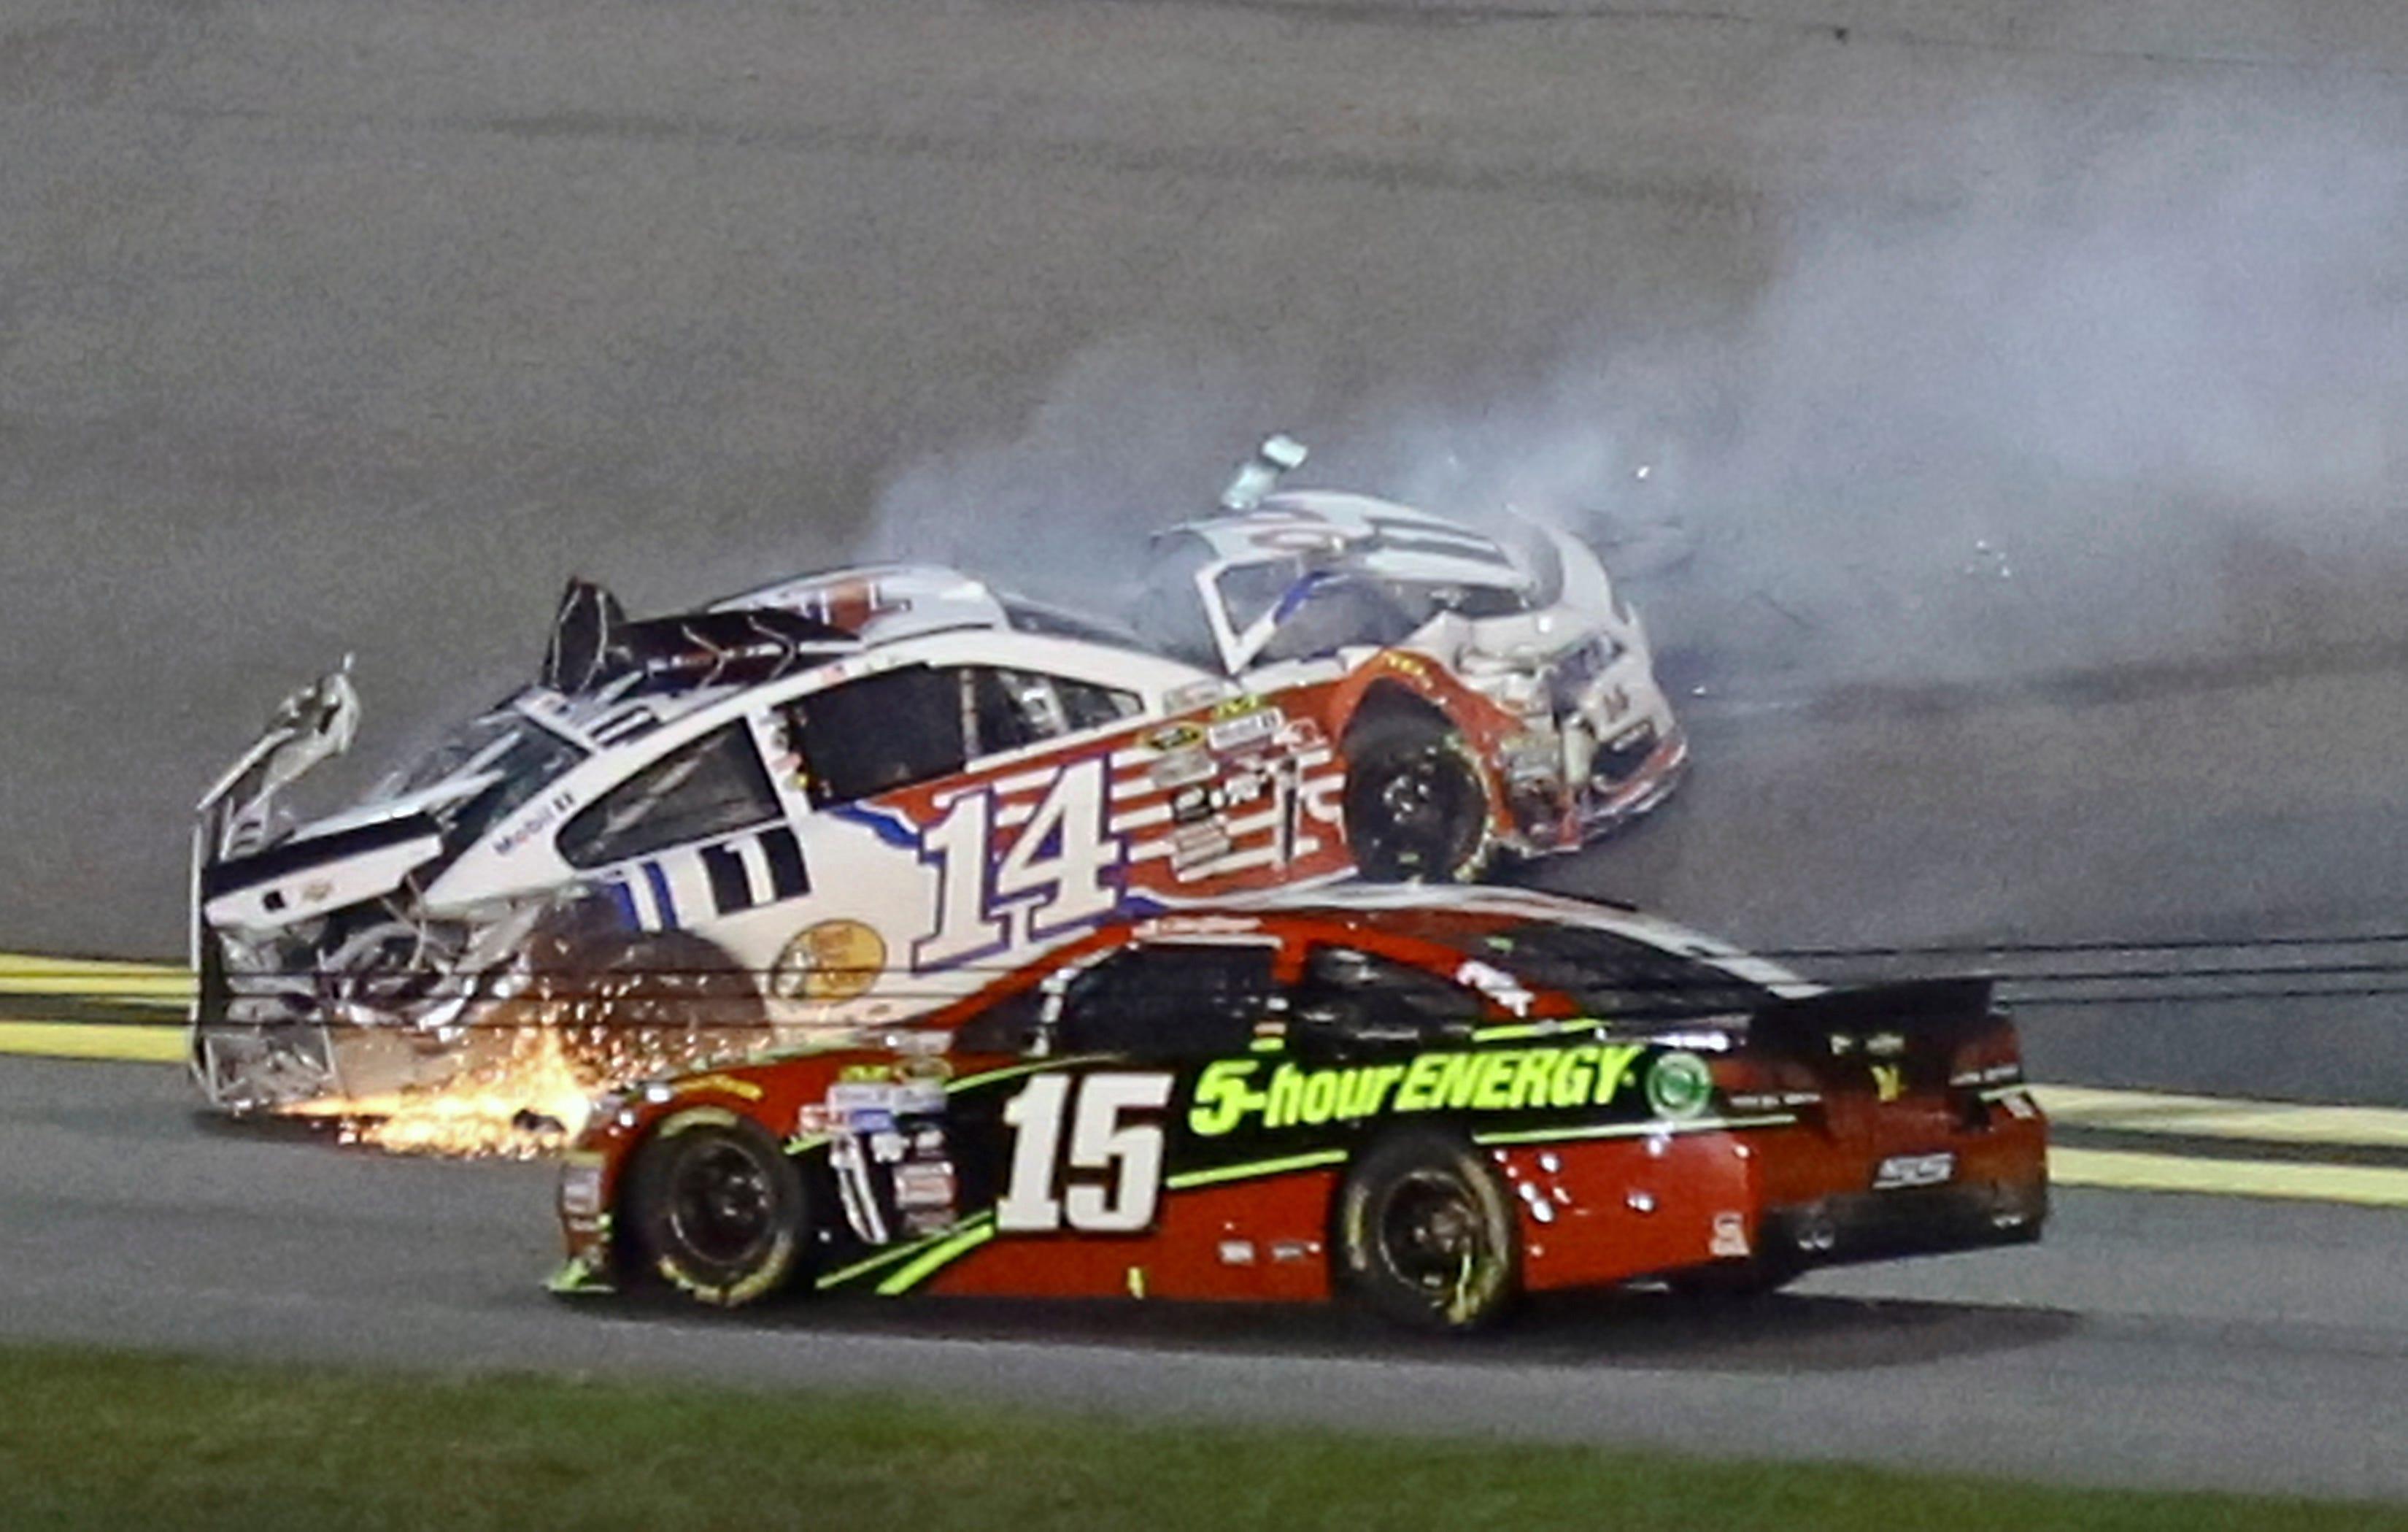 NASCAR drivers dismayed, dumbfounded by Talladega crashfest